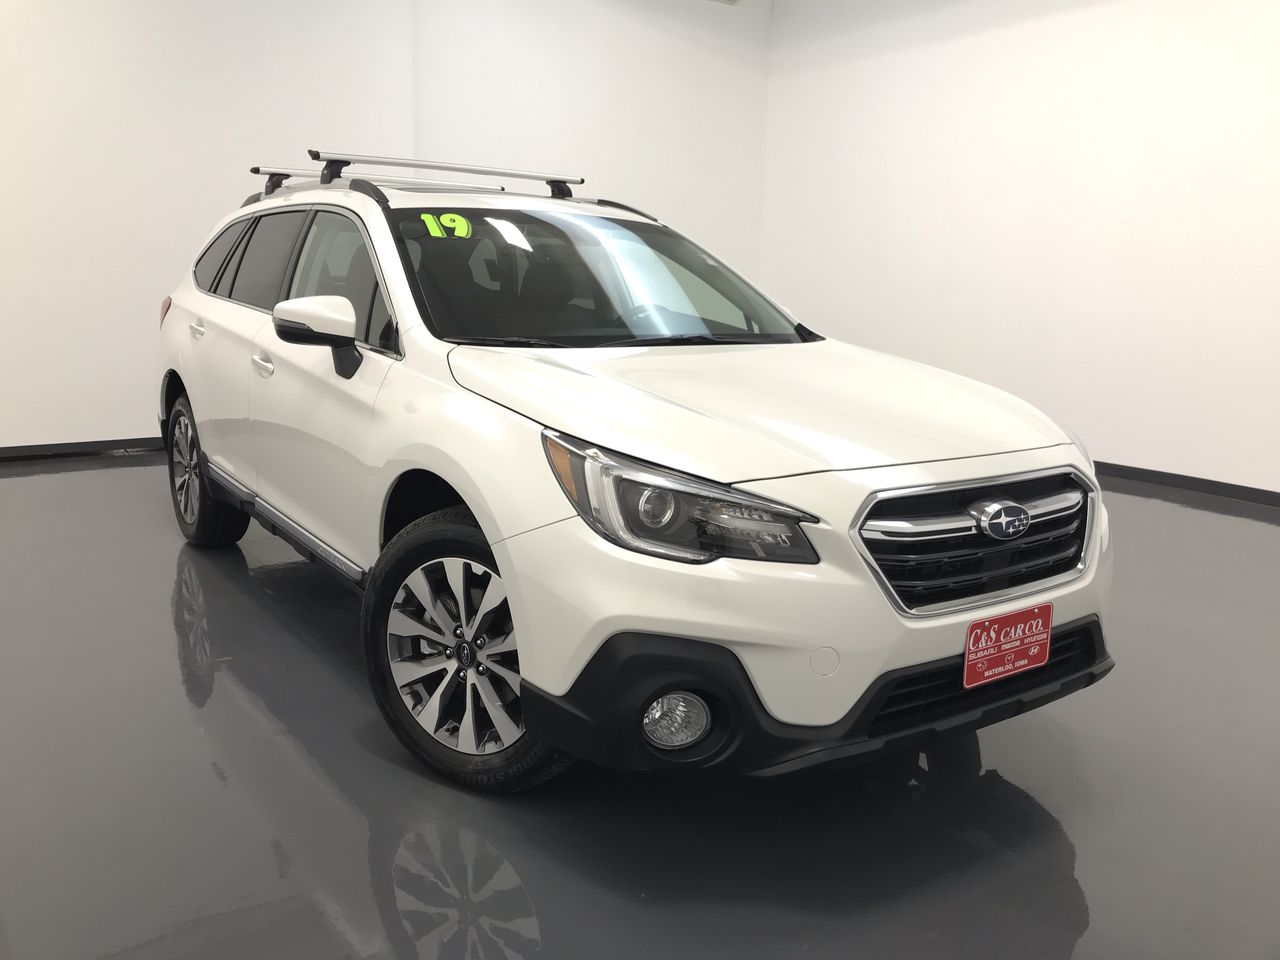 2019 Subaru Outback 3.6R Touring W/Eyesight